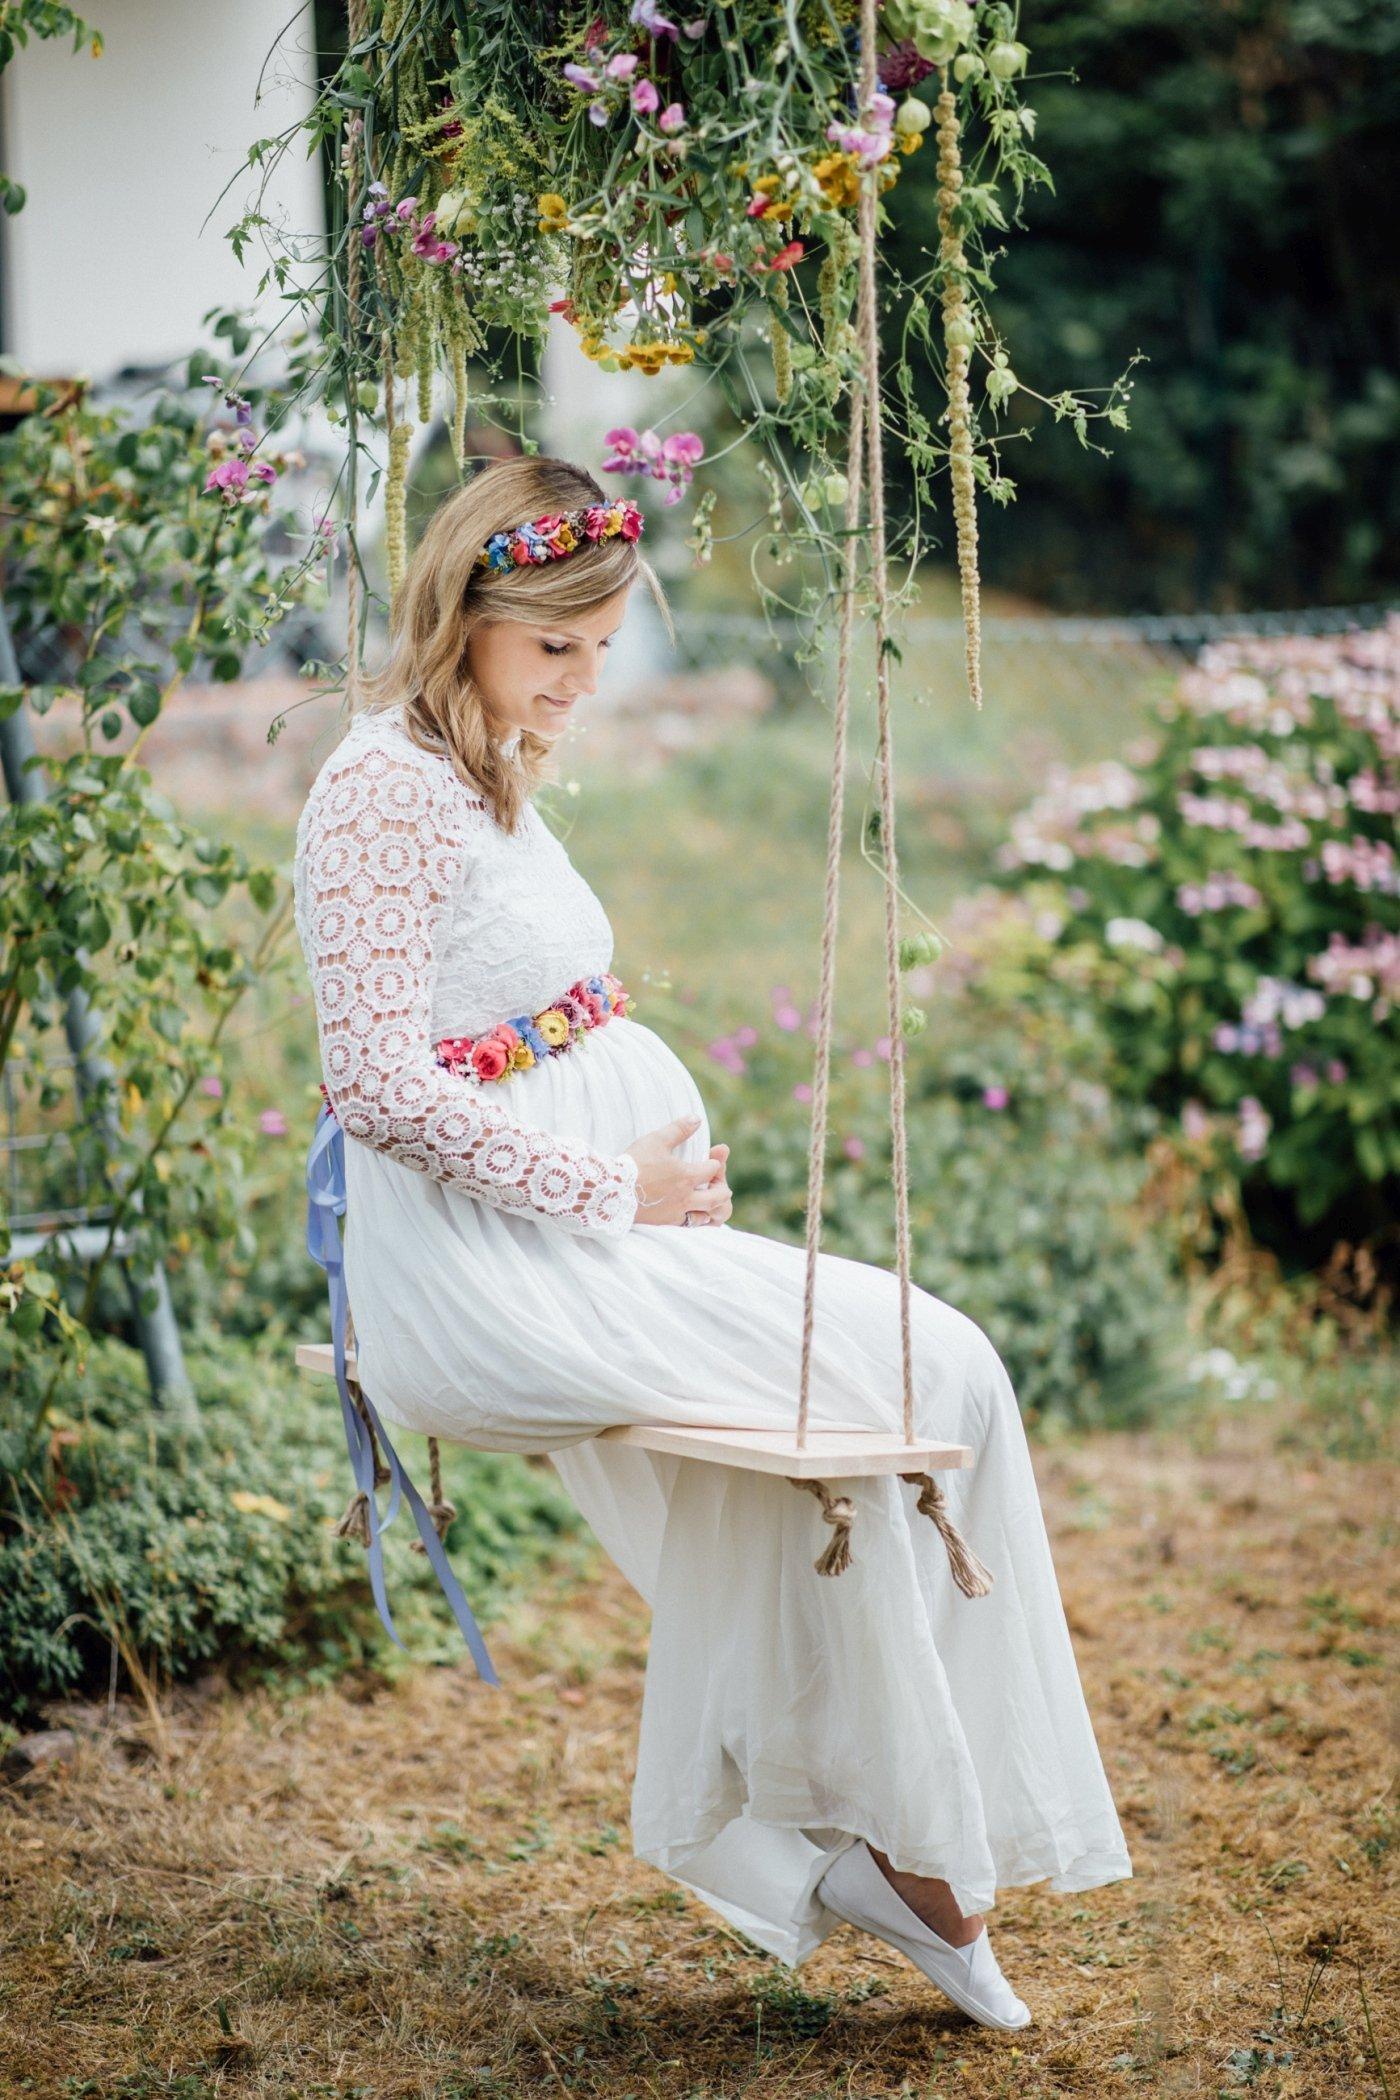 Babybauchfotos-Schwangerschaft-Paarfotos-Homeshooting-Pfalz-Landau-Karlsruhe-Heidelberg-Flowercron-Blumenguertel-Blumenschaukel